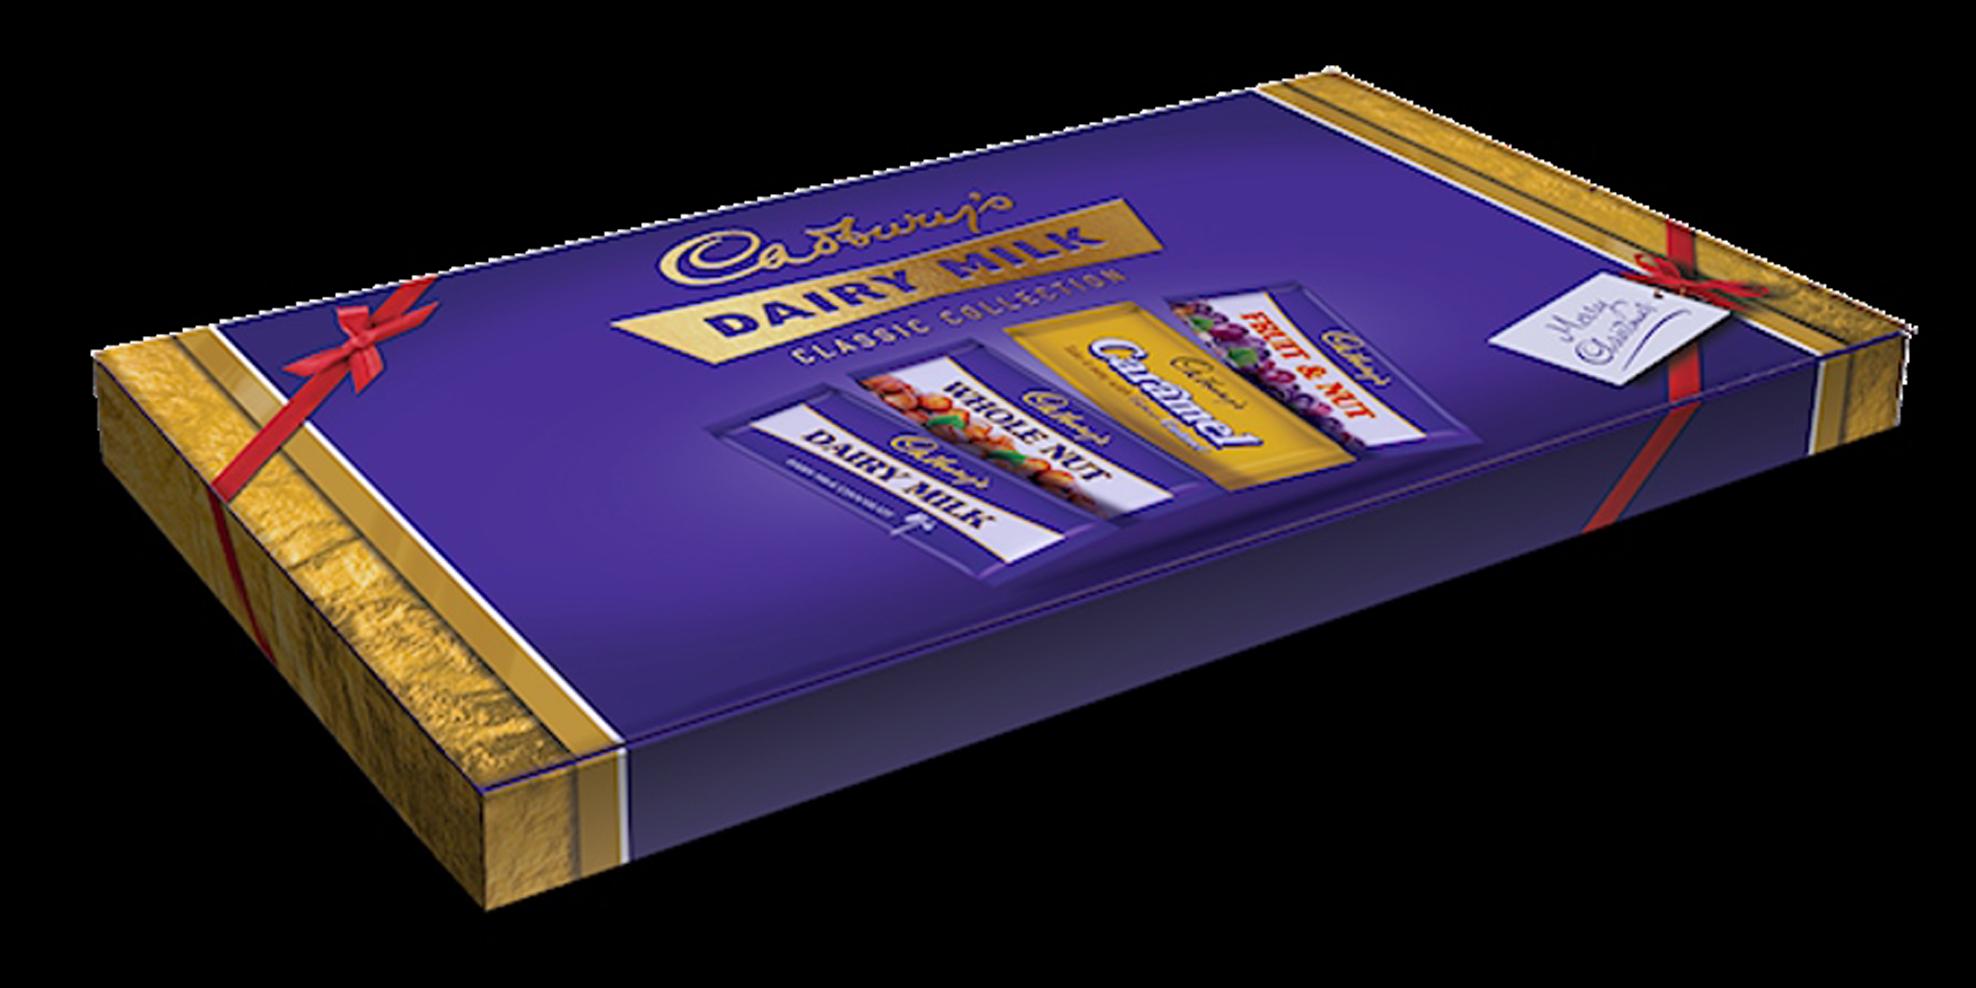 Cadbury Classic Collection Box